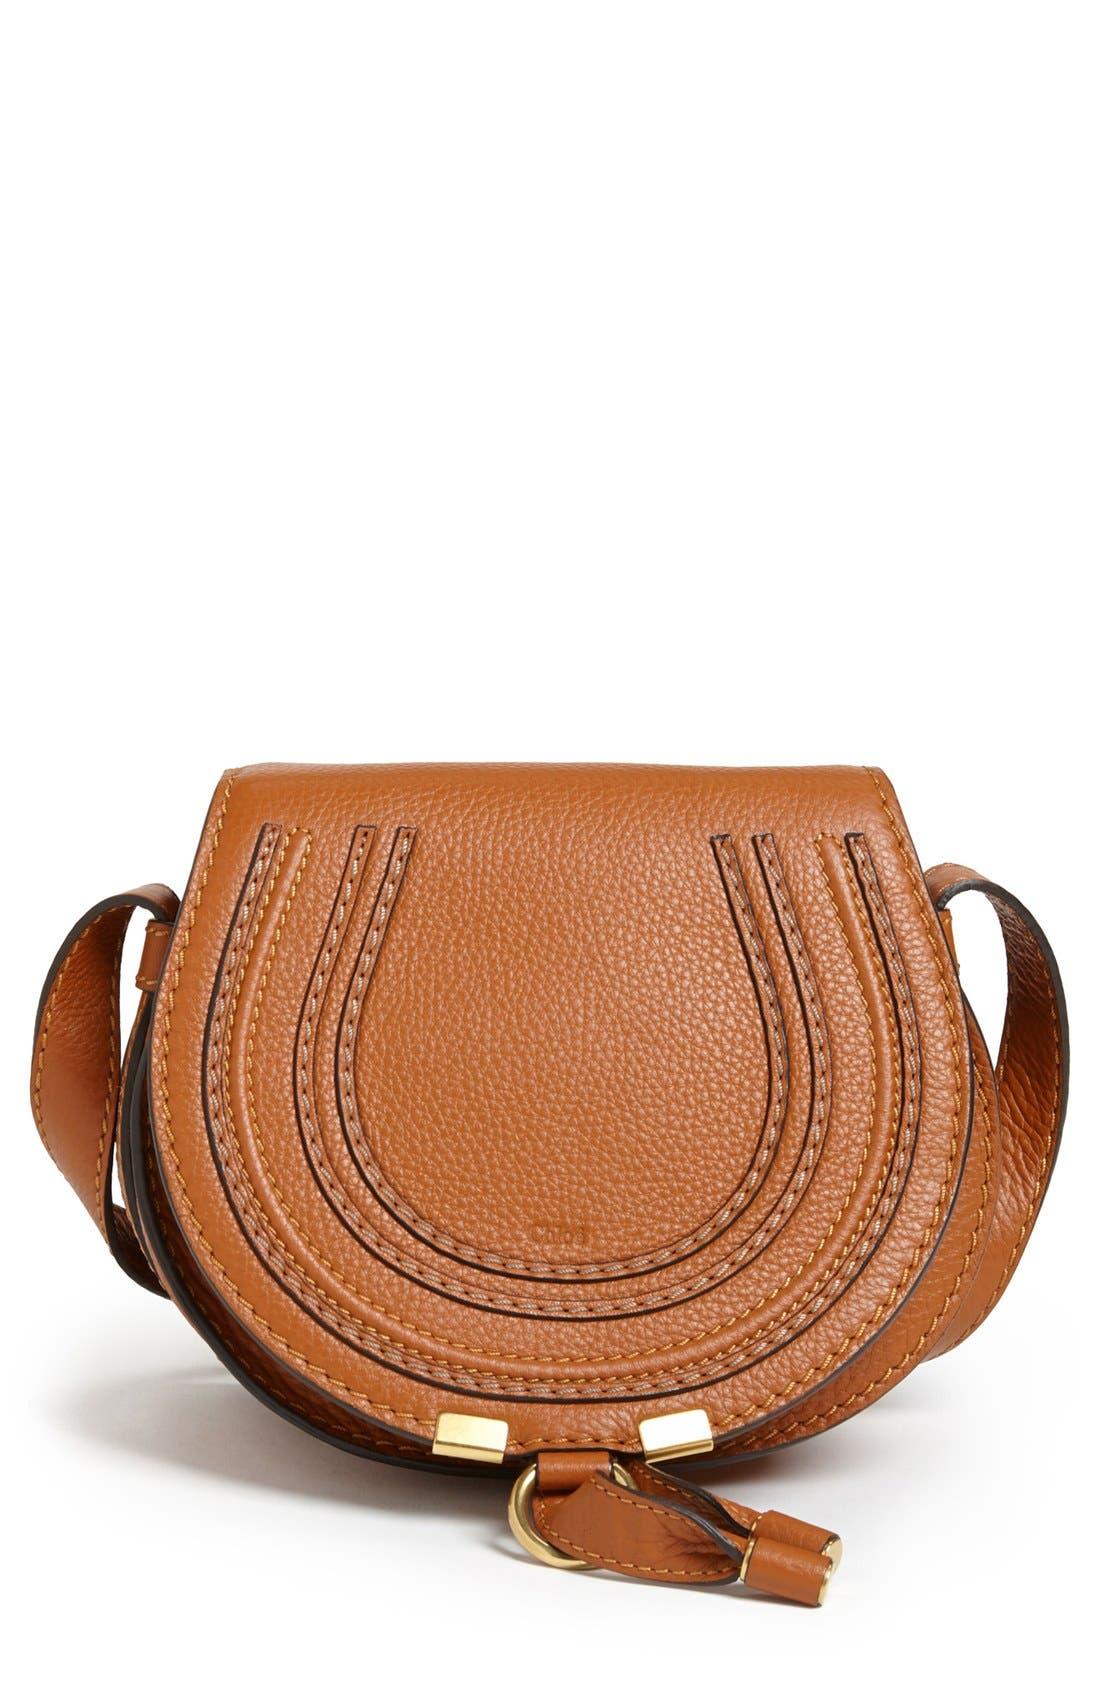 CHLOÉ, 'Mini Marcie' Leather Crossbody Bag, Main thumbnail 1, color, TAN GOLD HRDWRE